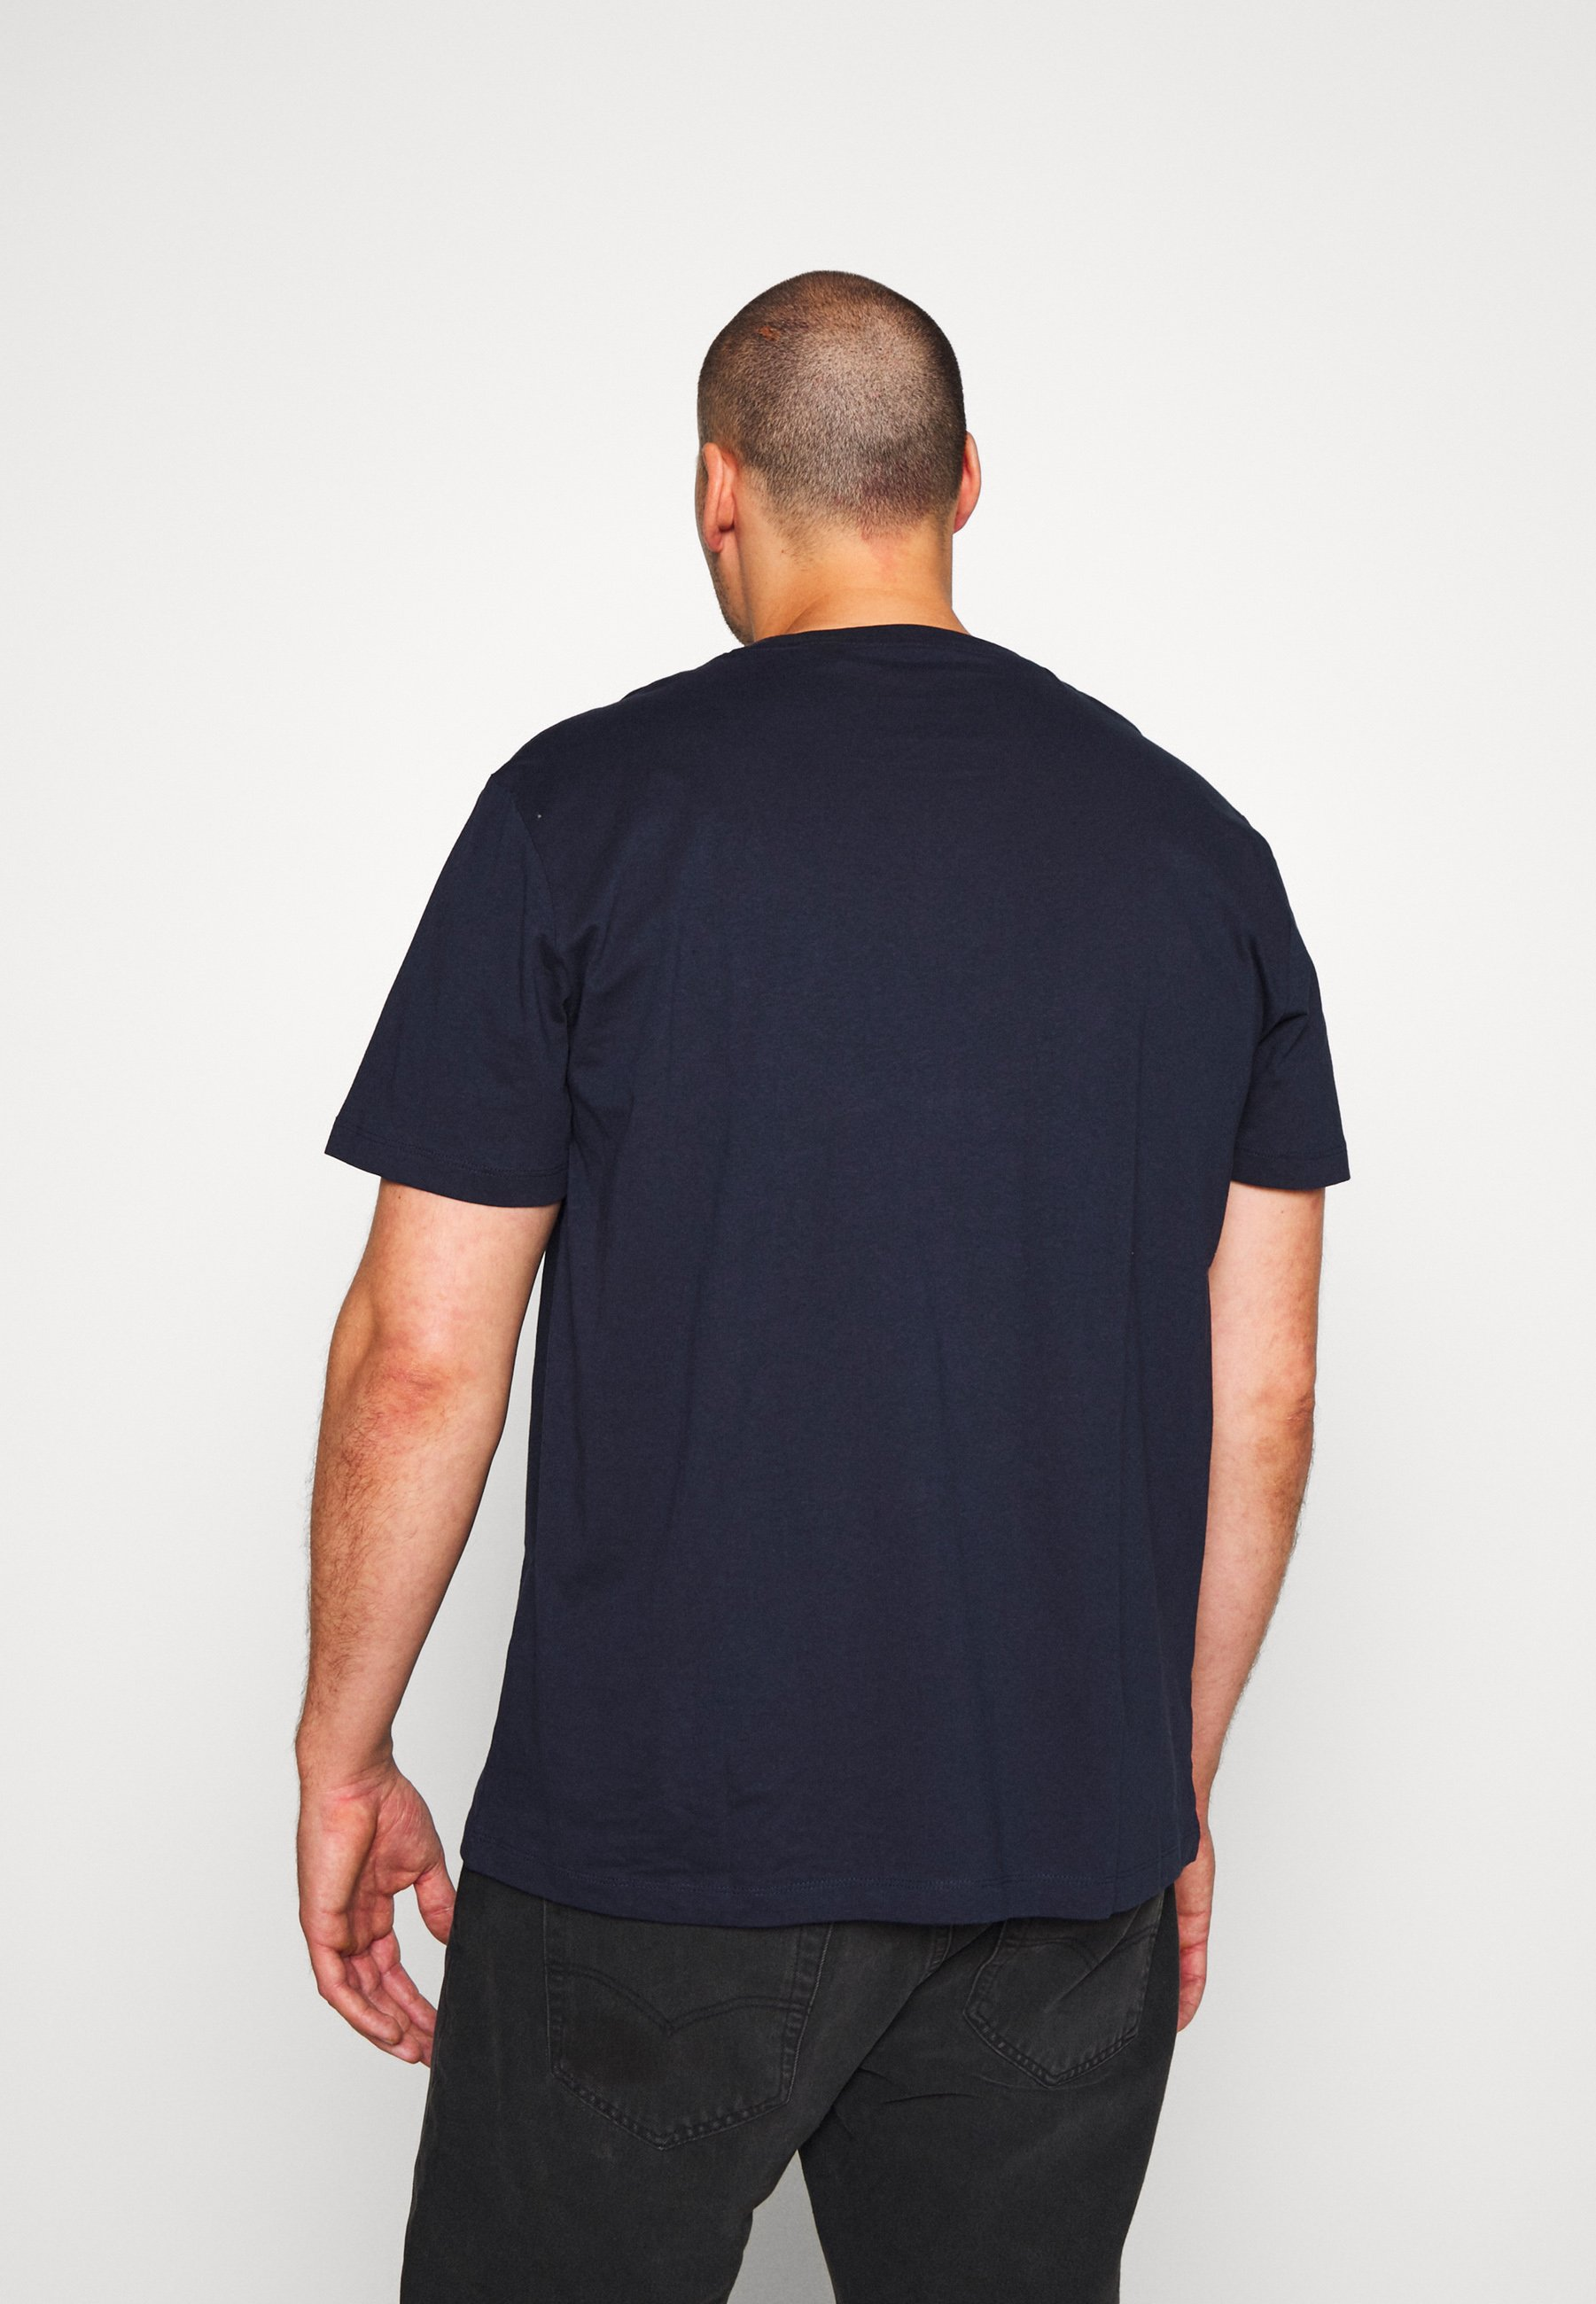 s.Oliver Print T-shirt - medieval blue gcXel